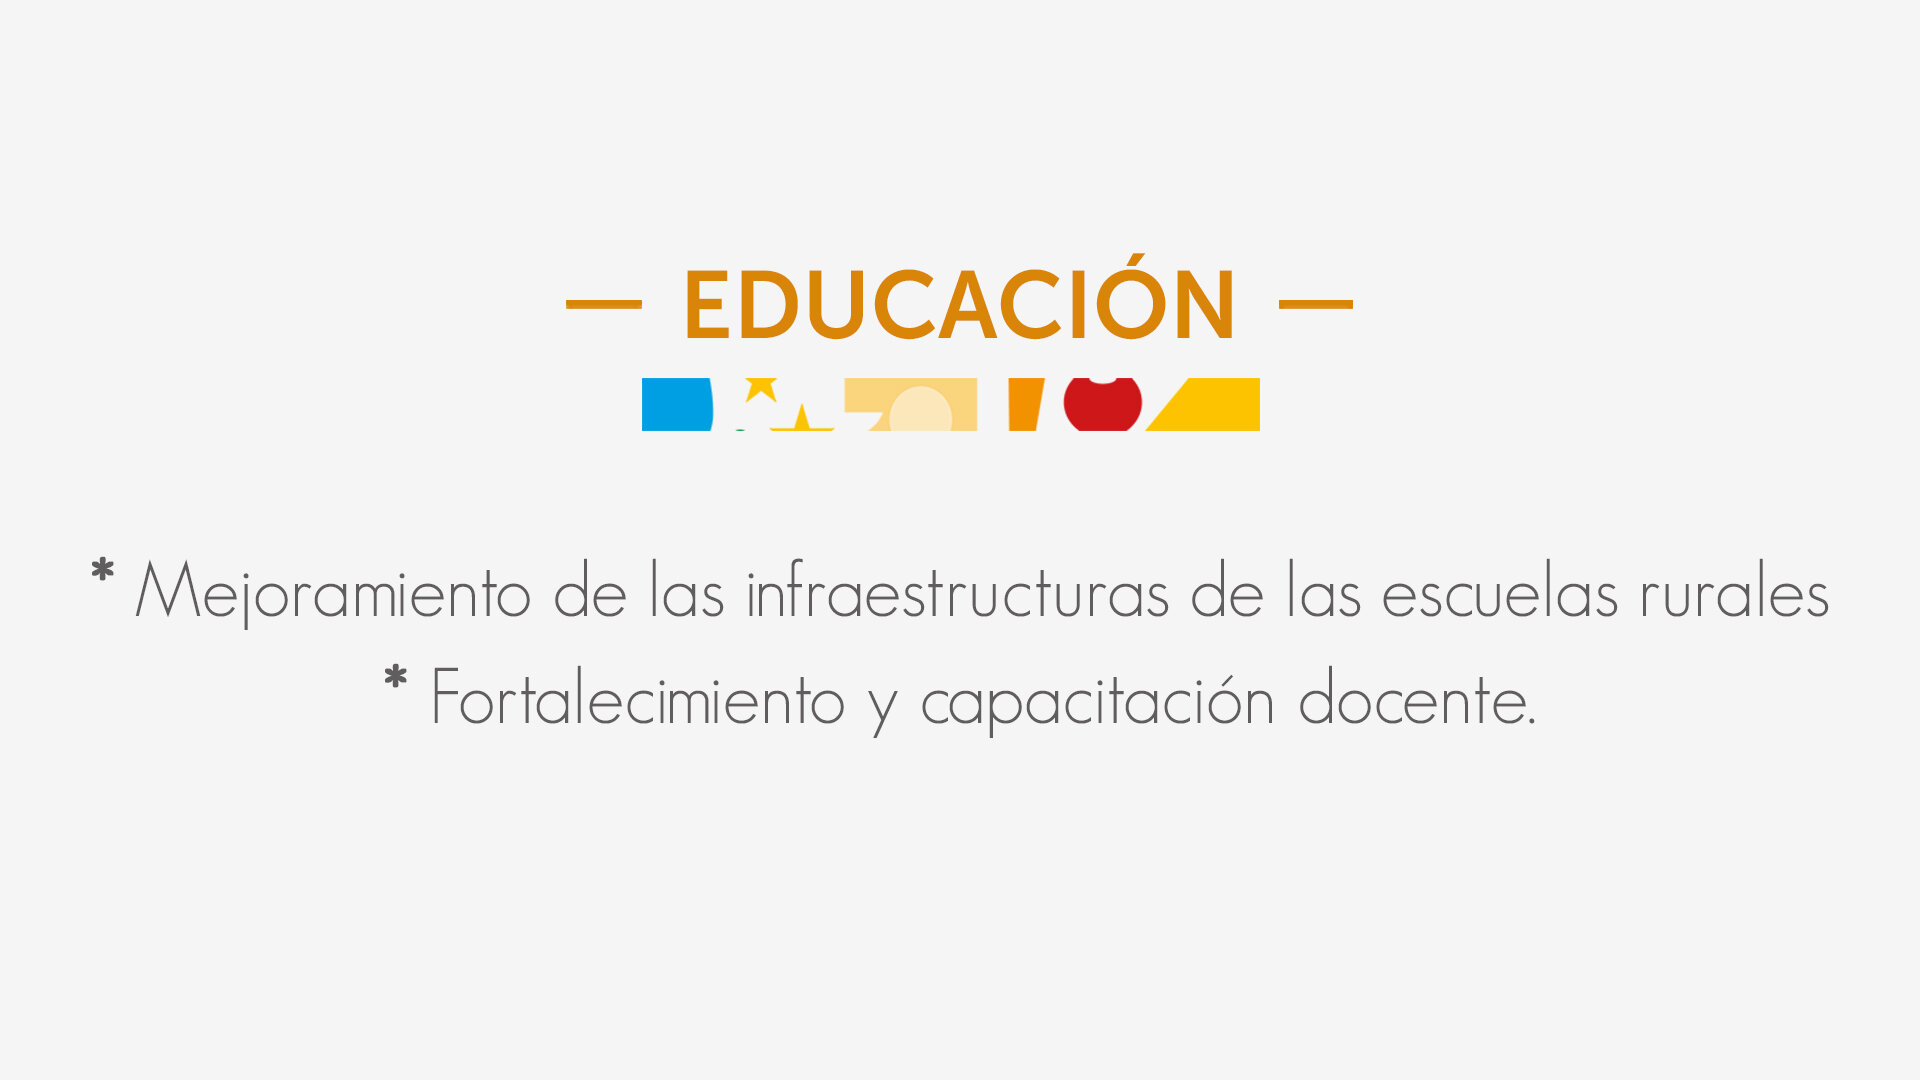 educacion.jpg